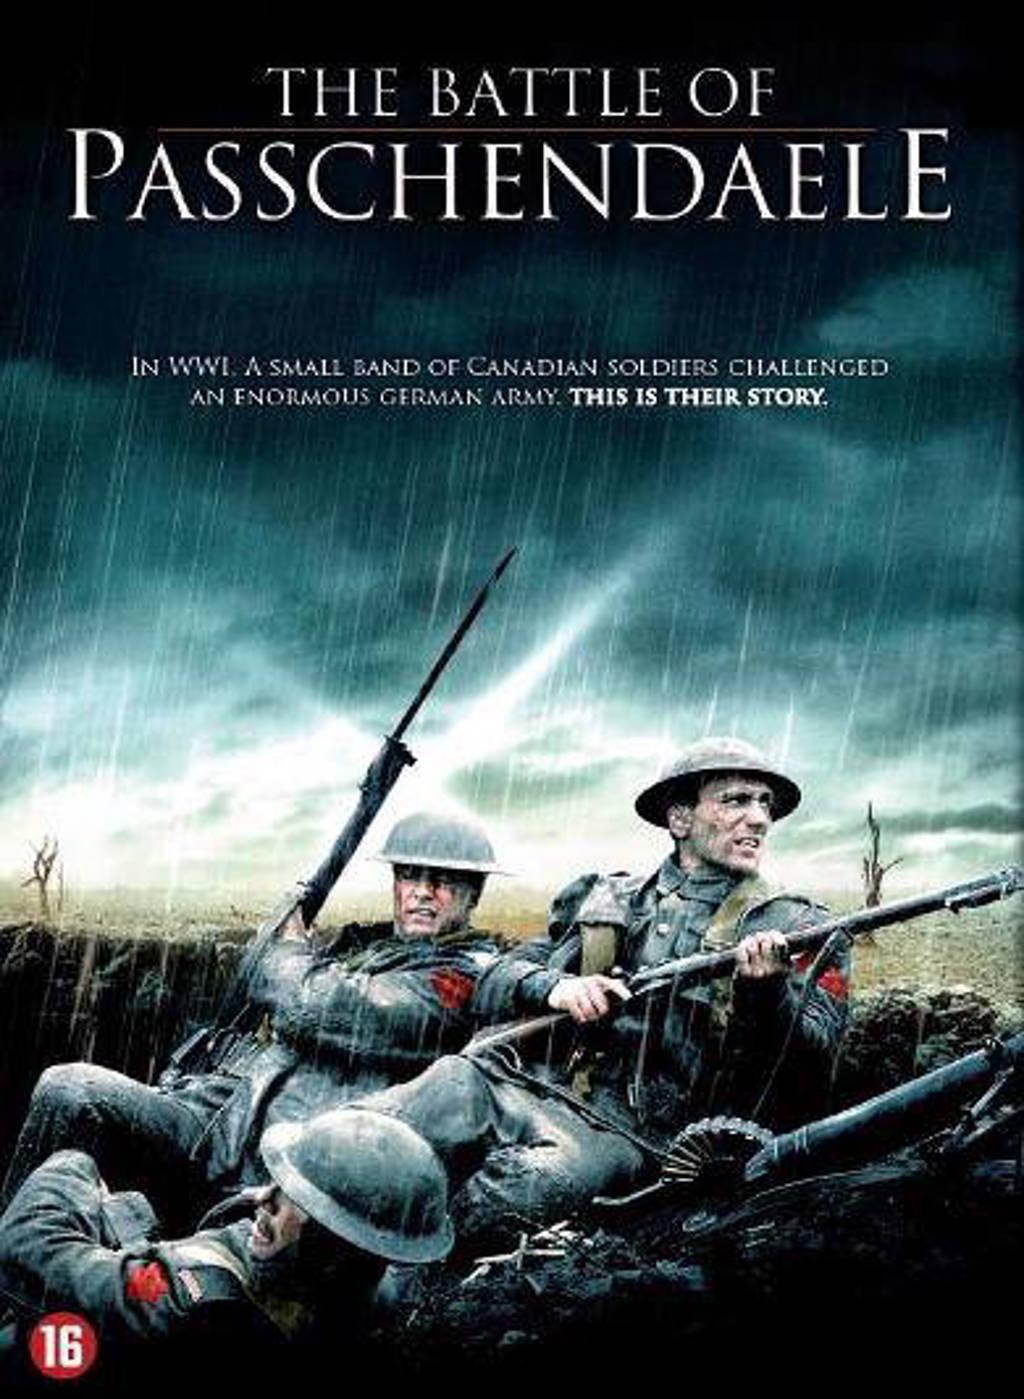 Battle of Passchendaele (DVD)